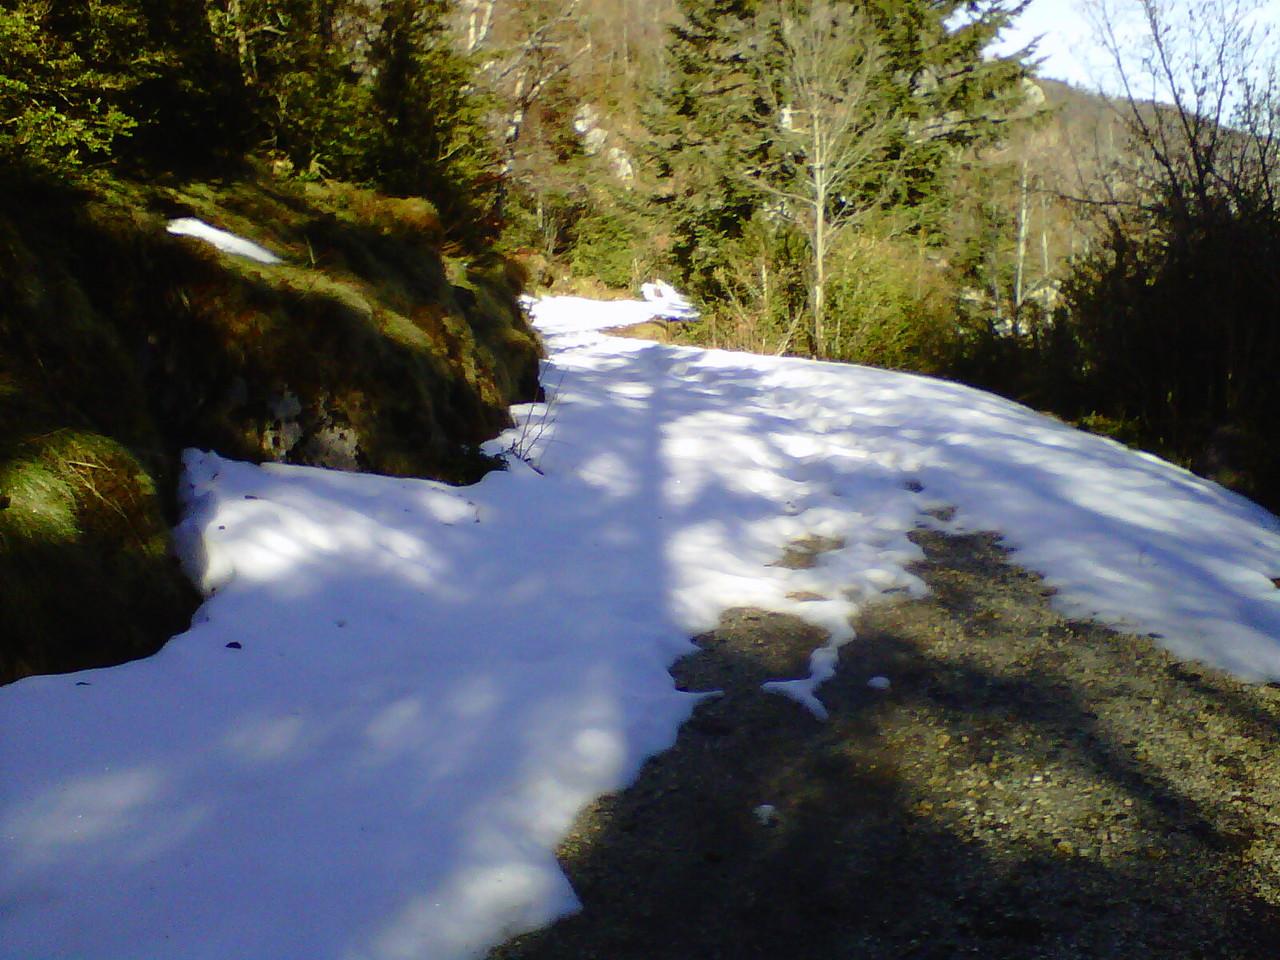 au km 8 vers Quirbajou.... sur la neige il marchera